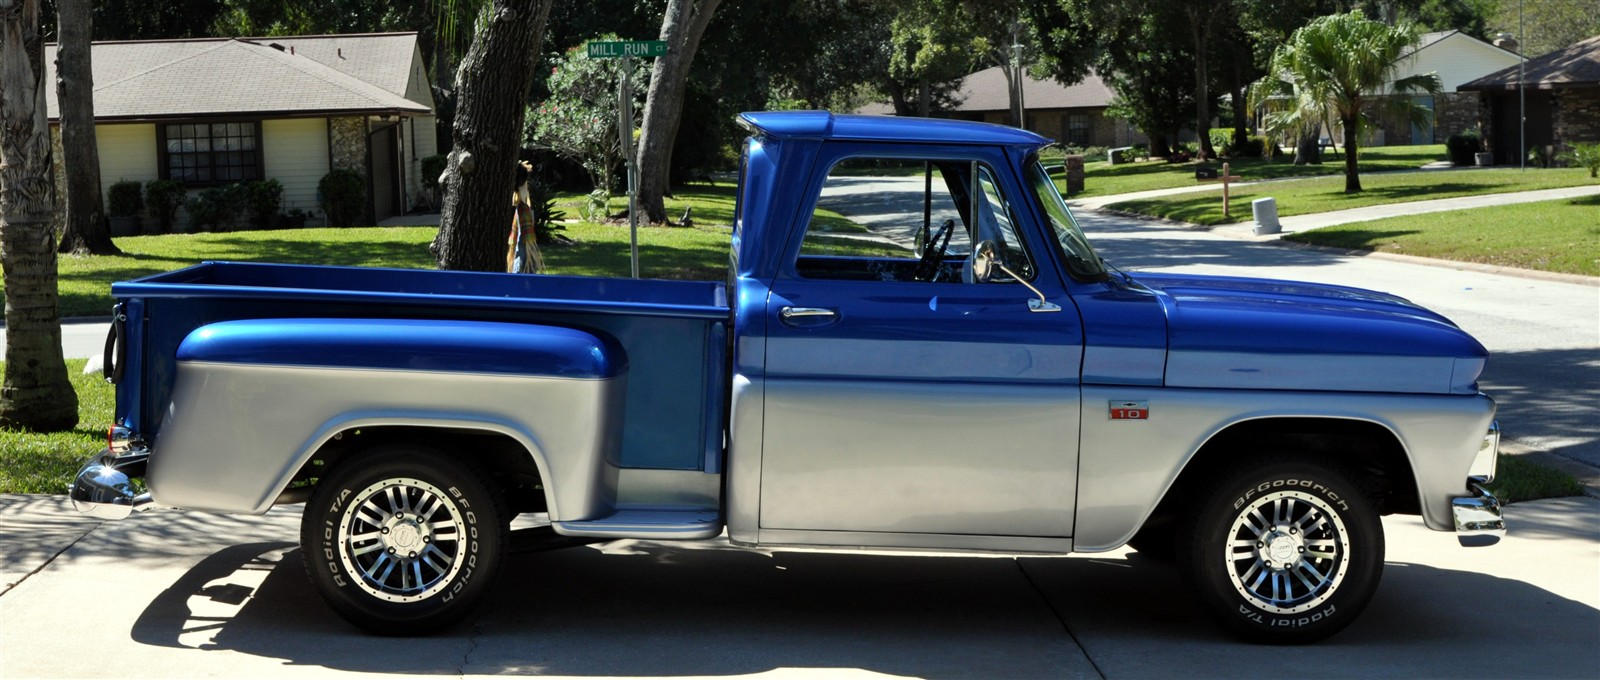 1966 Chevy Pickup